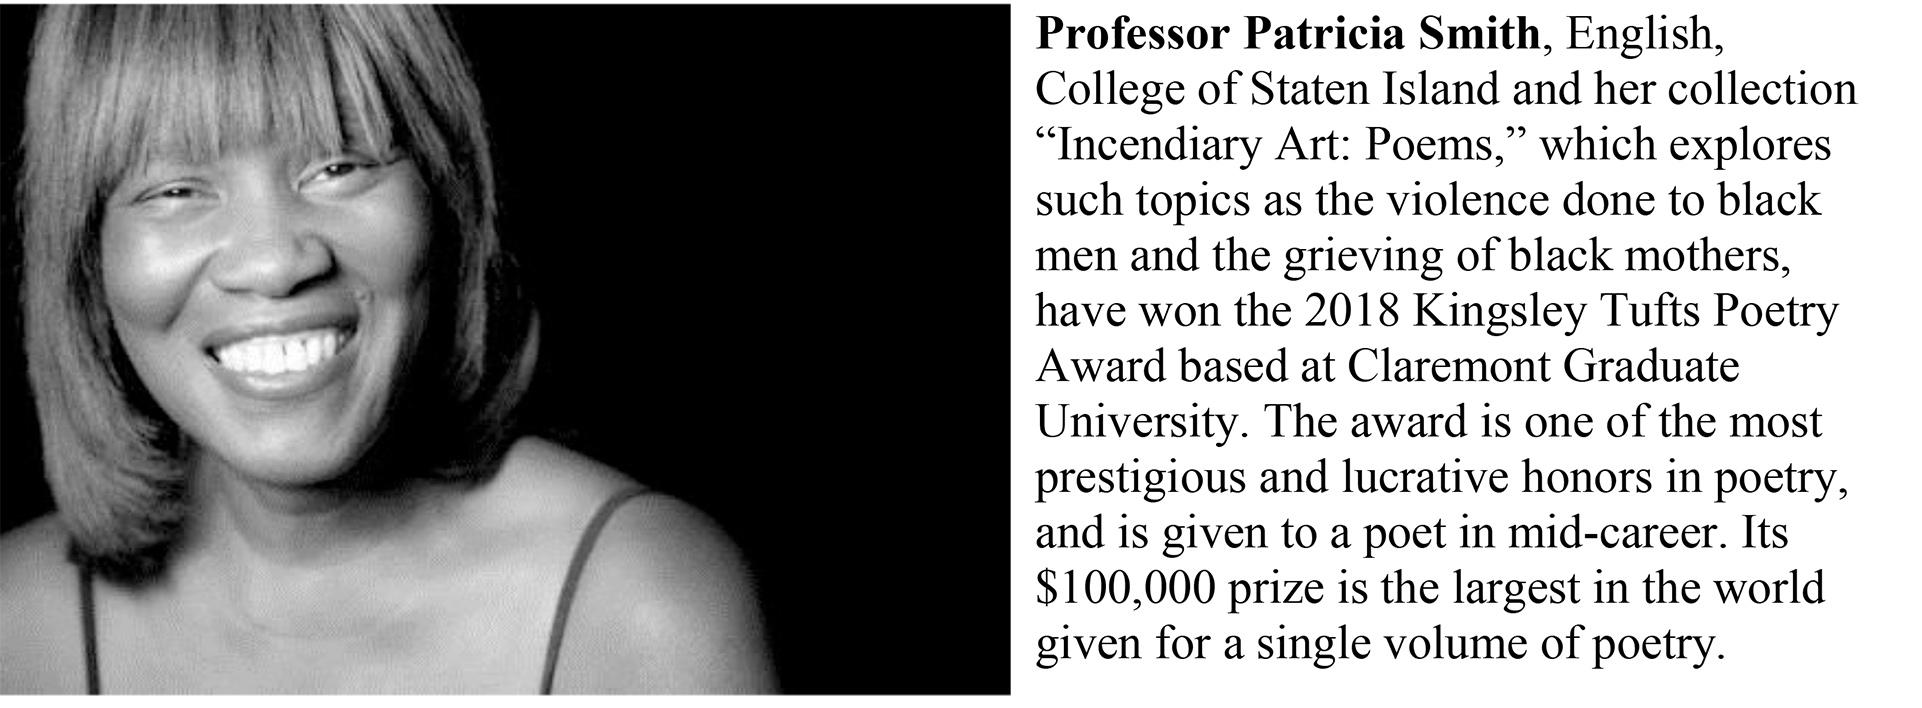 College of Staten Island Professor Patricia Smith, award winning poet